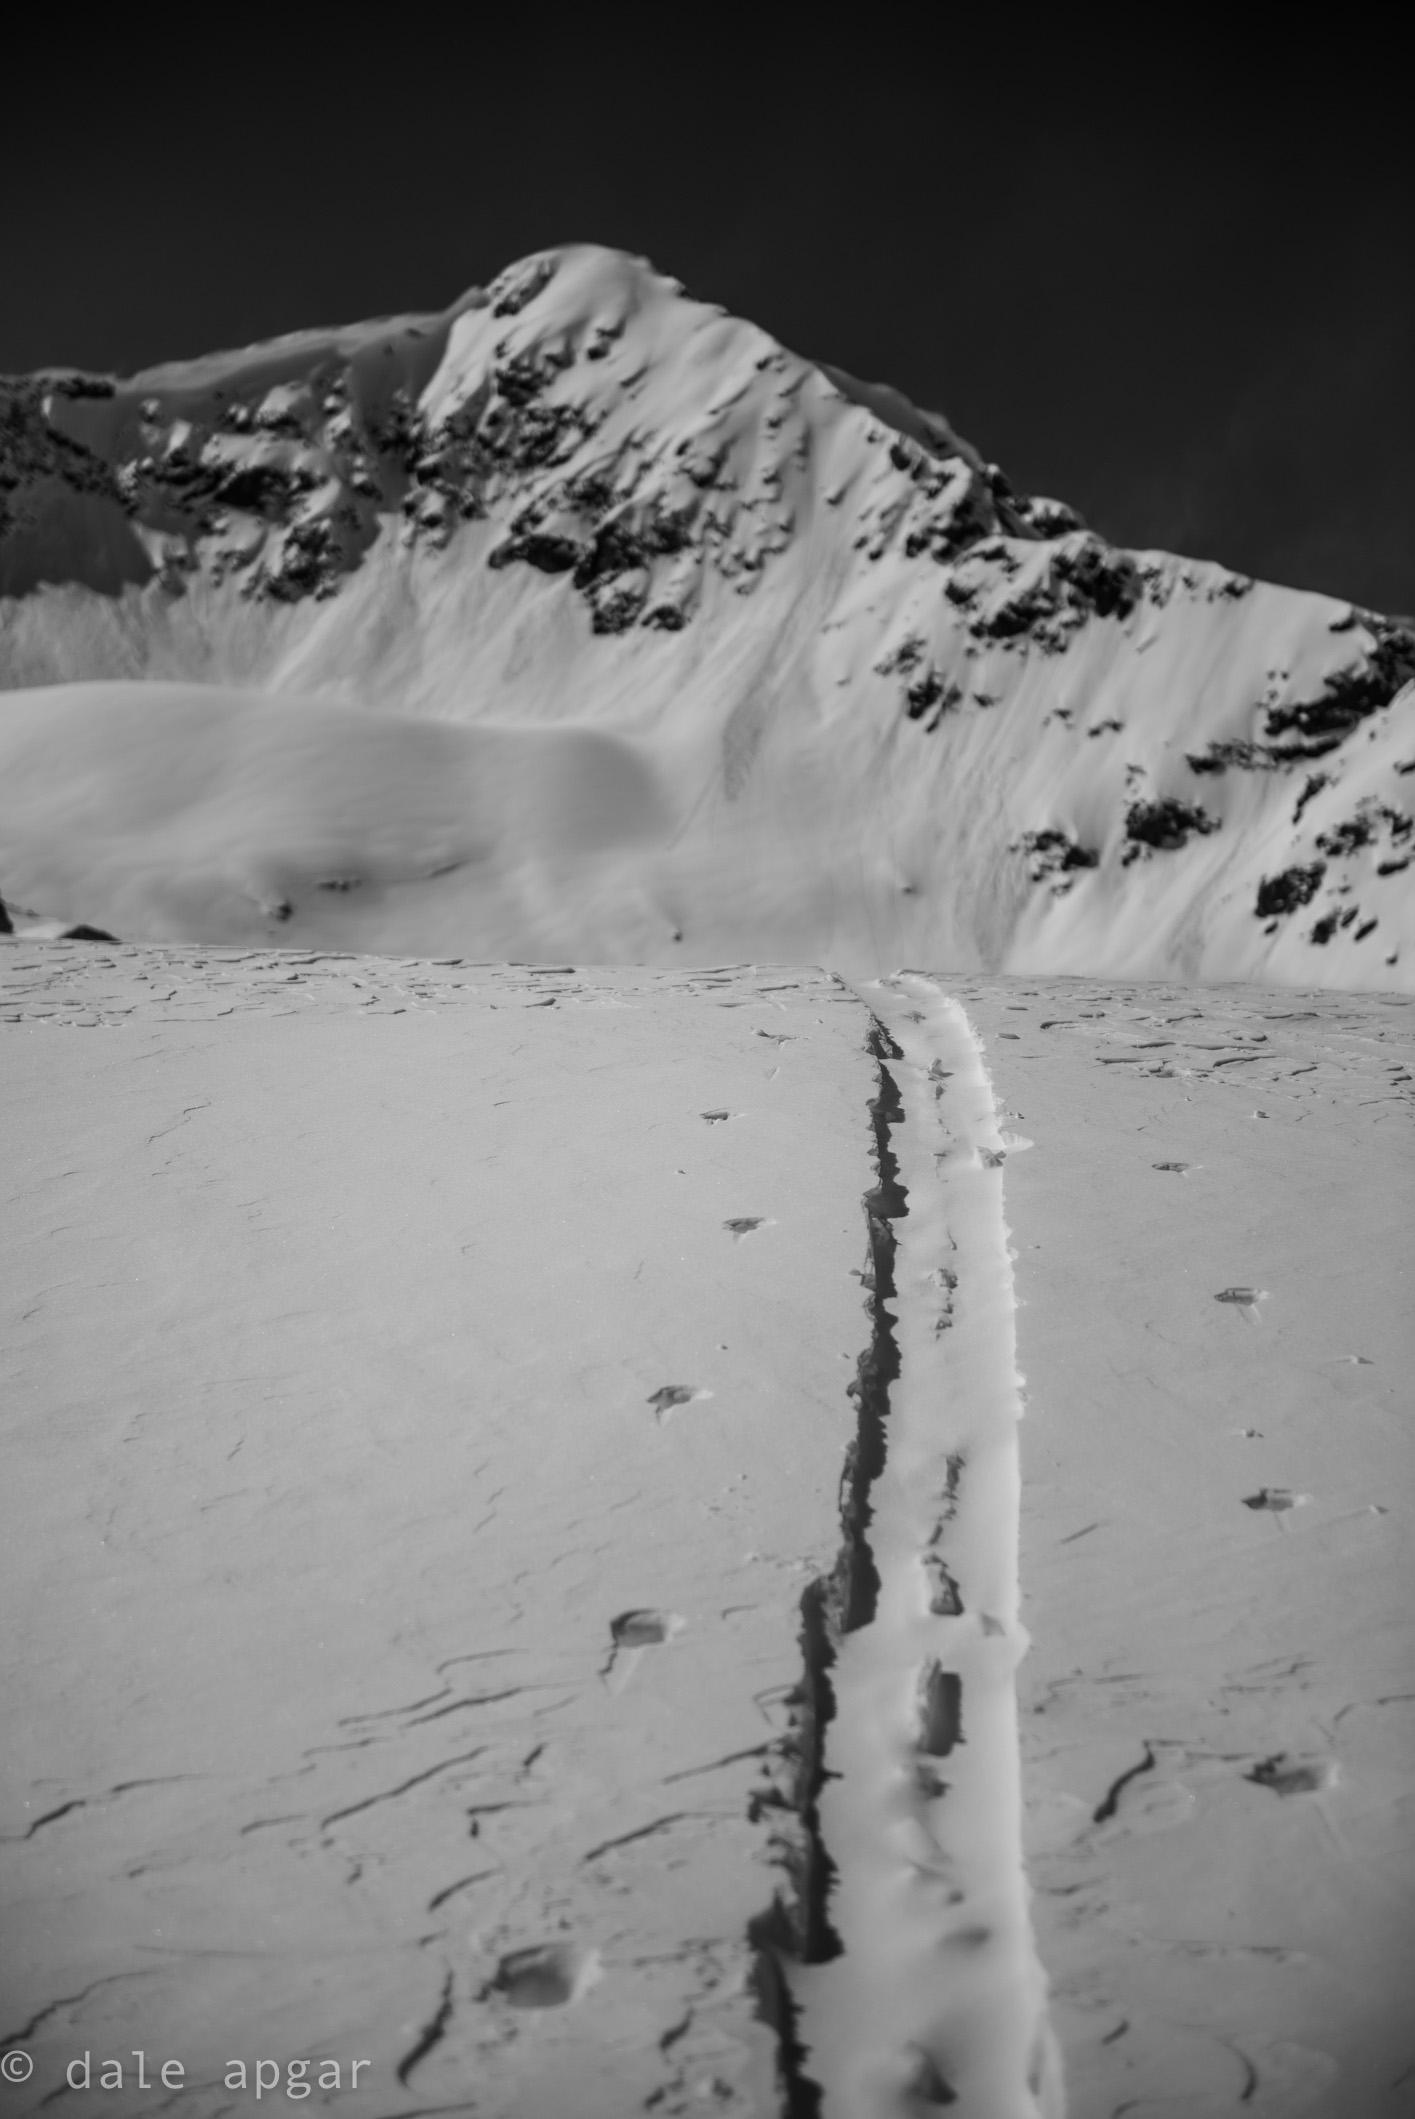 dale_apgar_ski-23.jpg